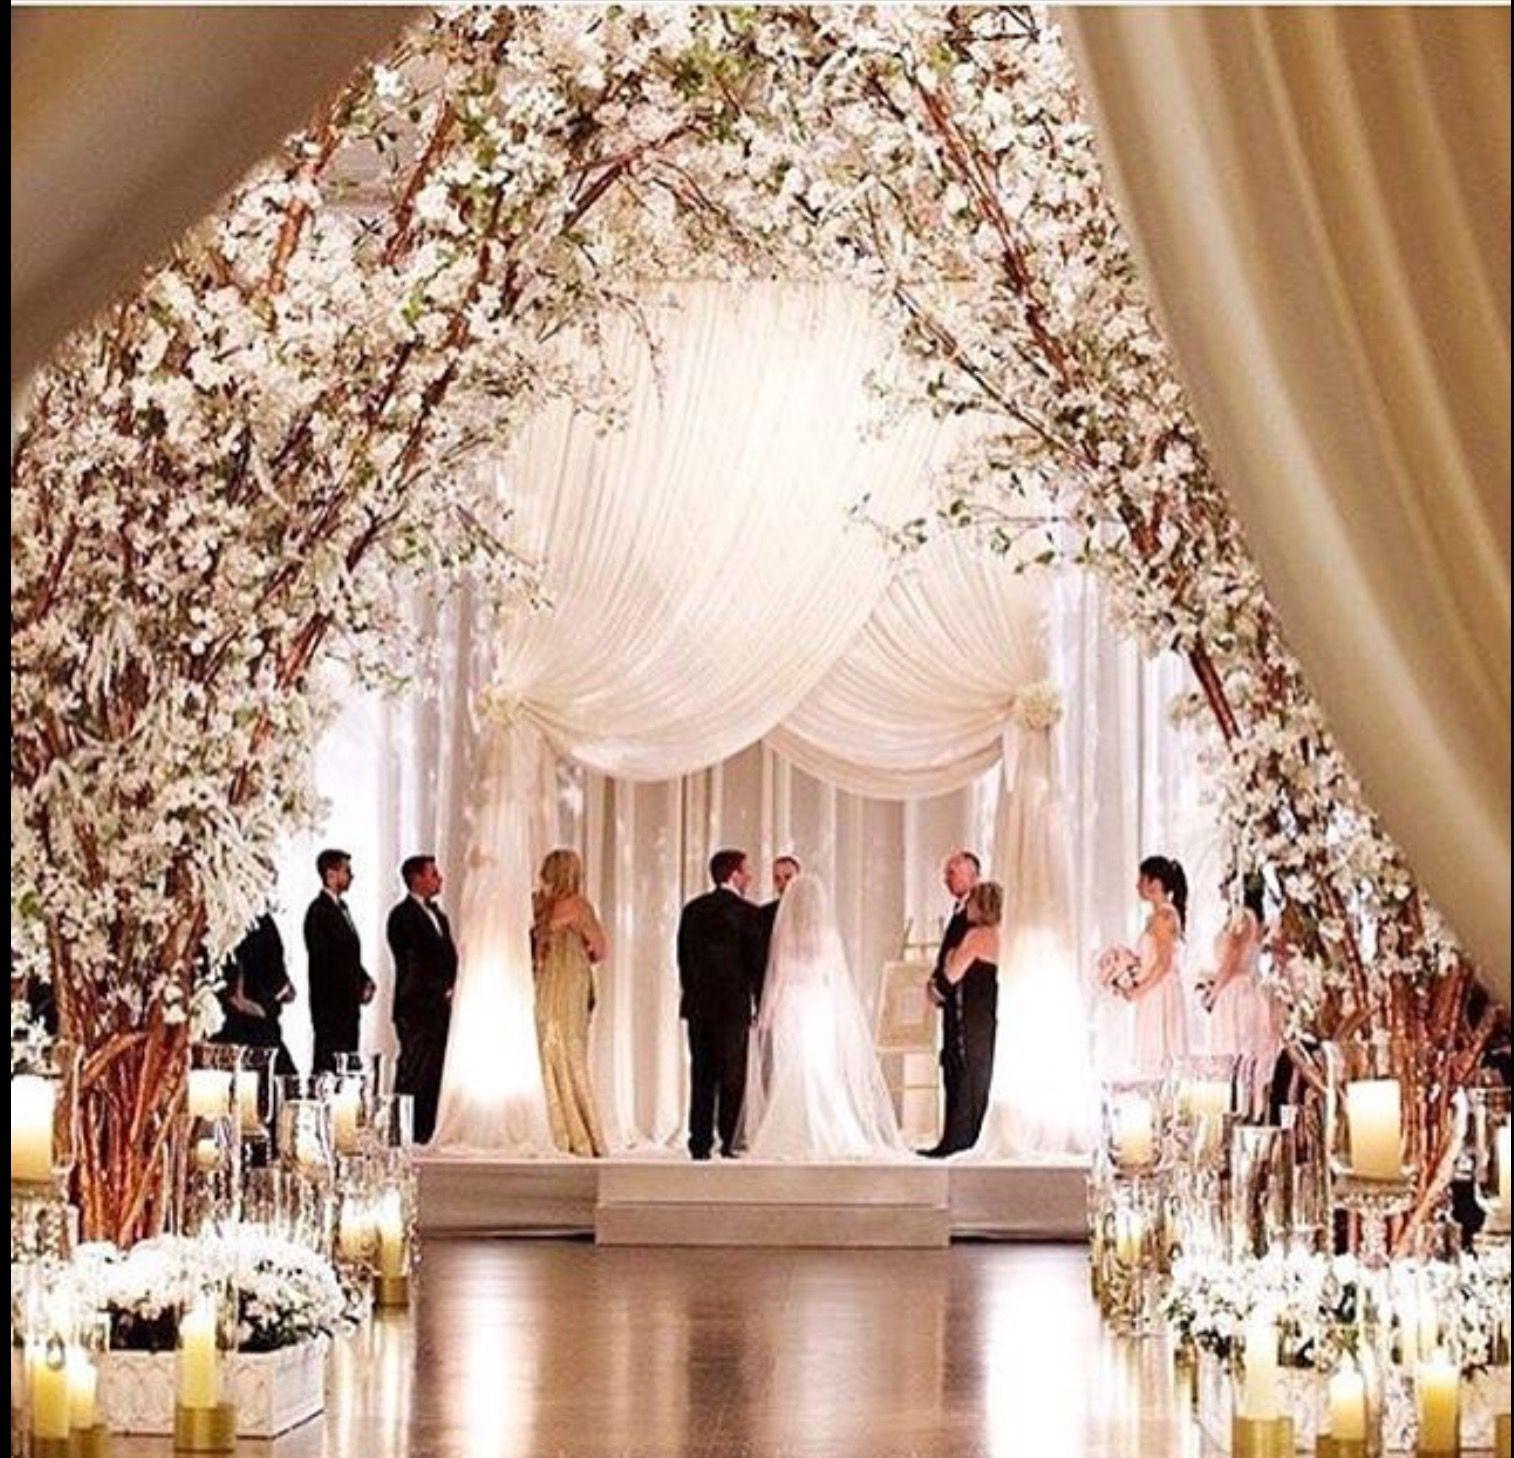 Stylish Wedding Ceremony Decor: Pin By Brides By Liza On Wedding Designs Tables Etc